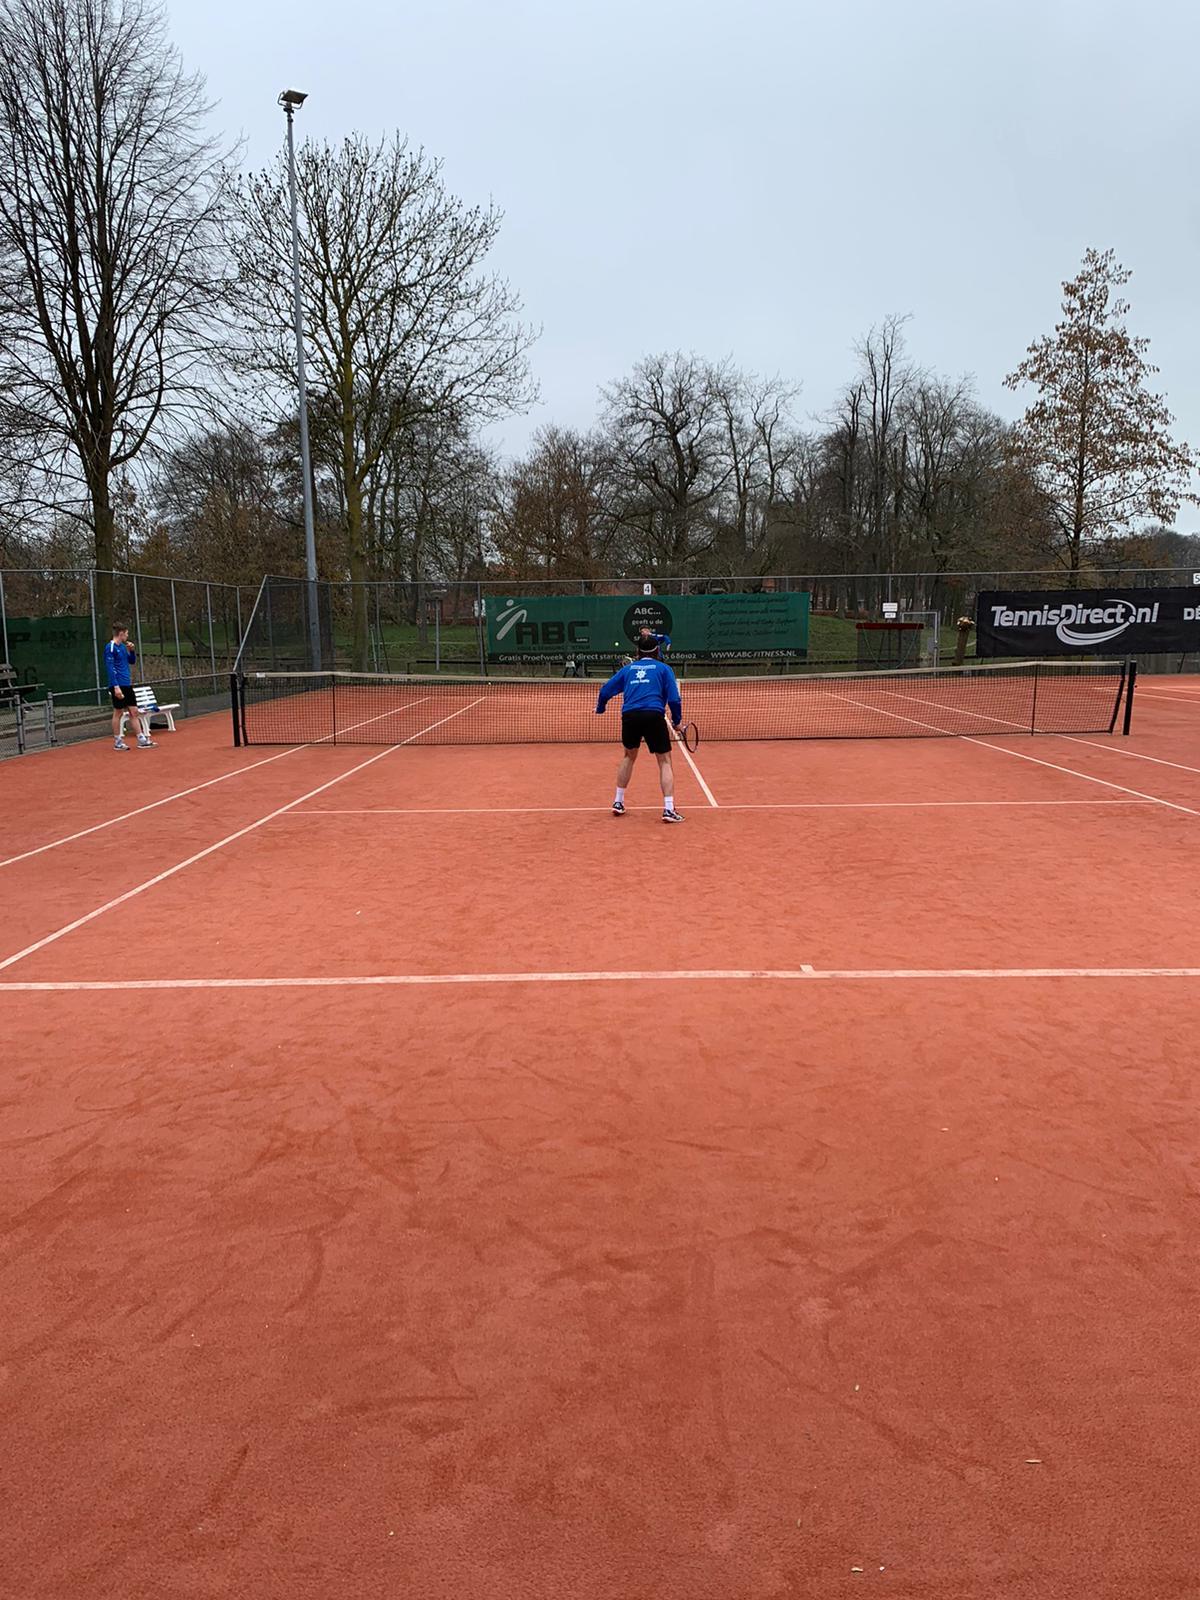 Vierde training ESC1 in 2021, tennistoernooi - Elburger SC